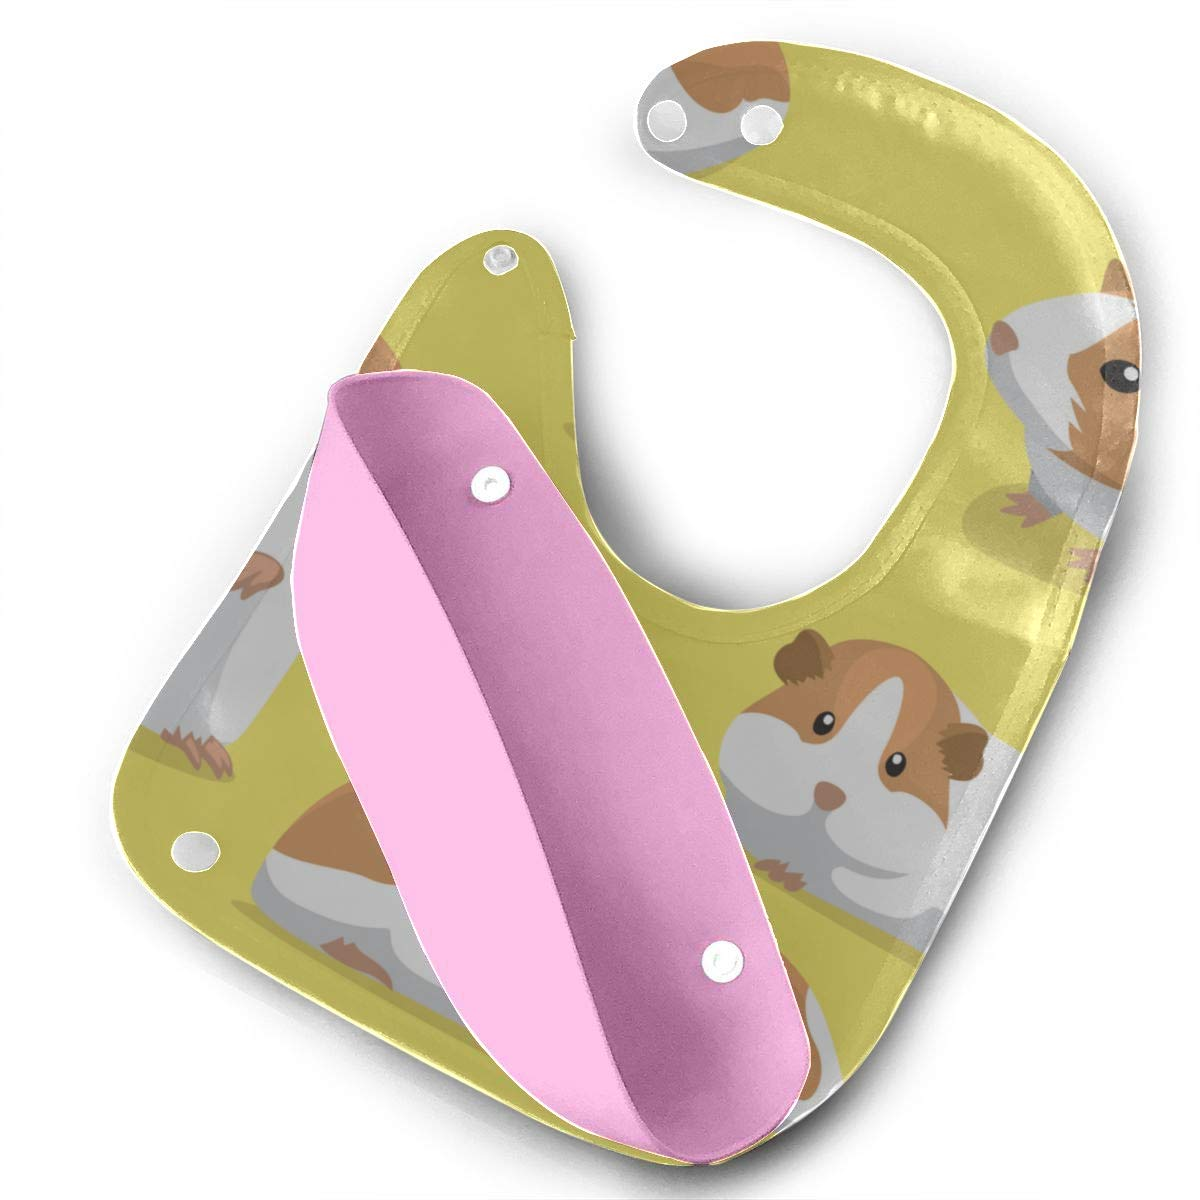 Drool Bibs Cartoon Cute Guinea Pig Detachable Silicone Feeding Apron Mouse Towel Baby Feeding Dribble Drool Bib Infant Bib Funny